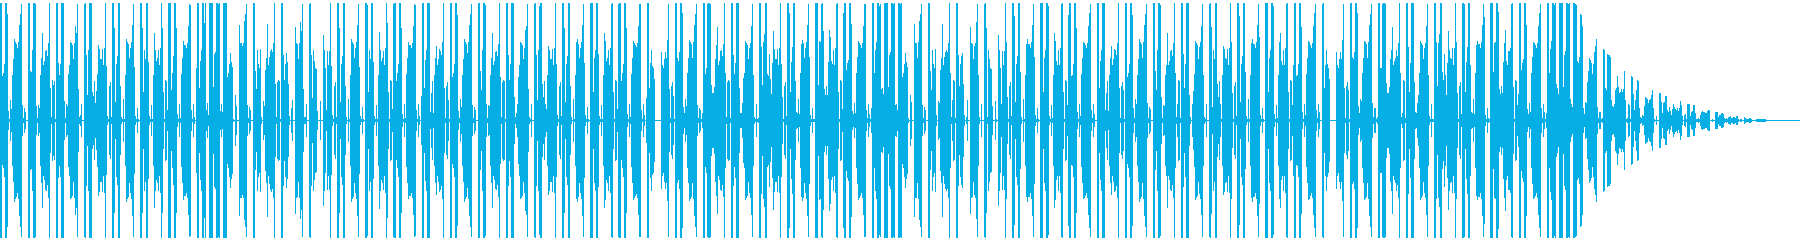 Jazzy,Lo-Fi Hip Hopの再生済みの波形